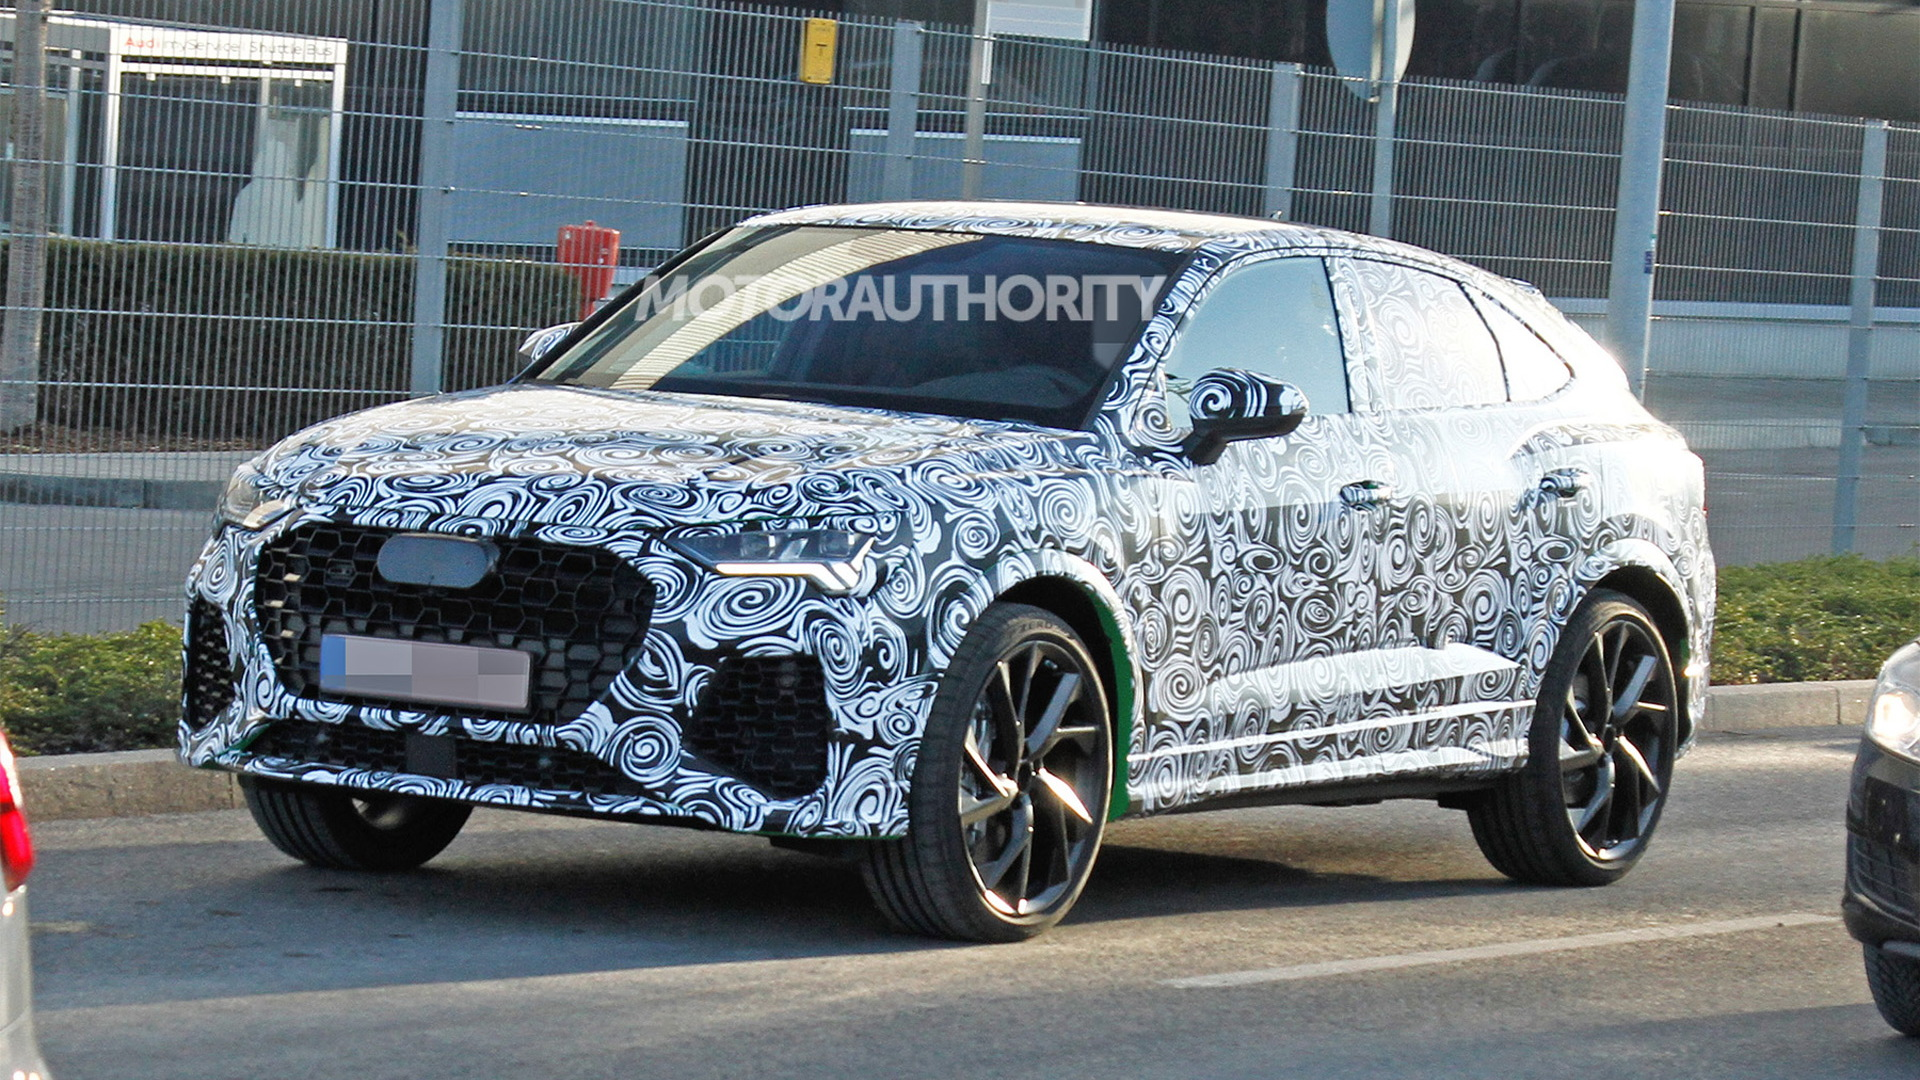 2021 Audi RS Q4 spy shots - Image via S. Baldauf/SB-Medien